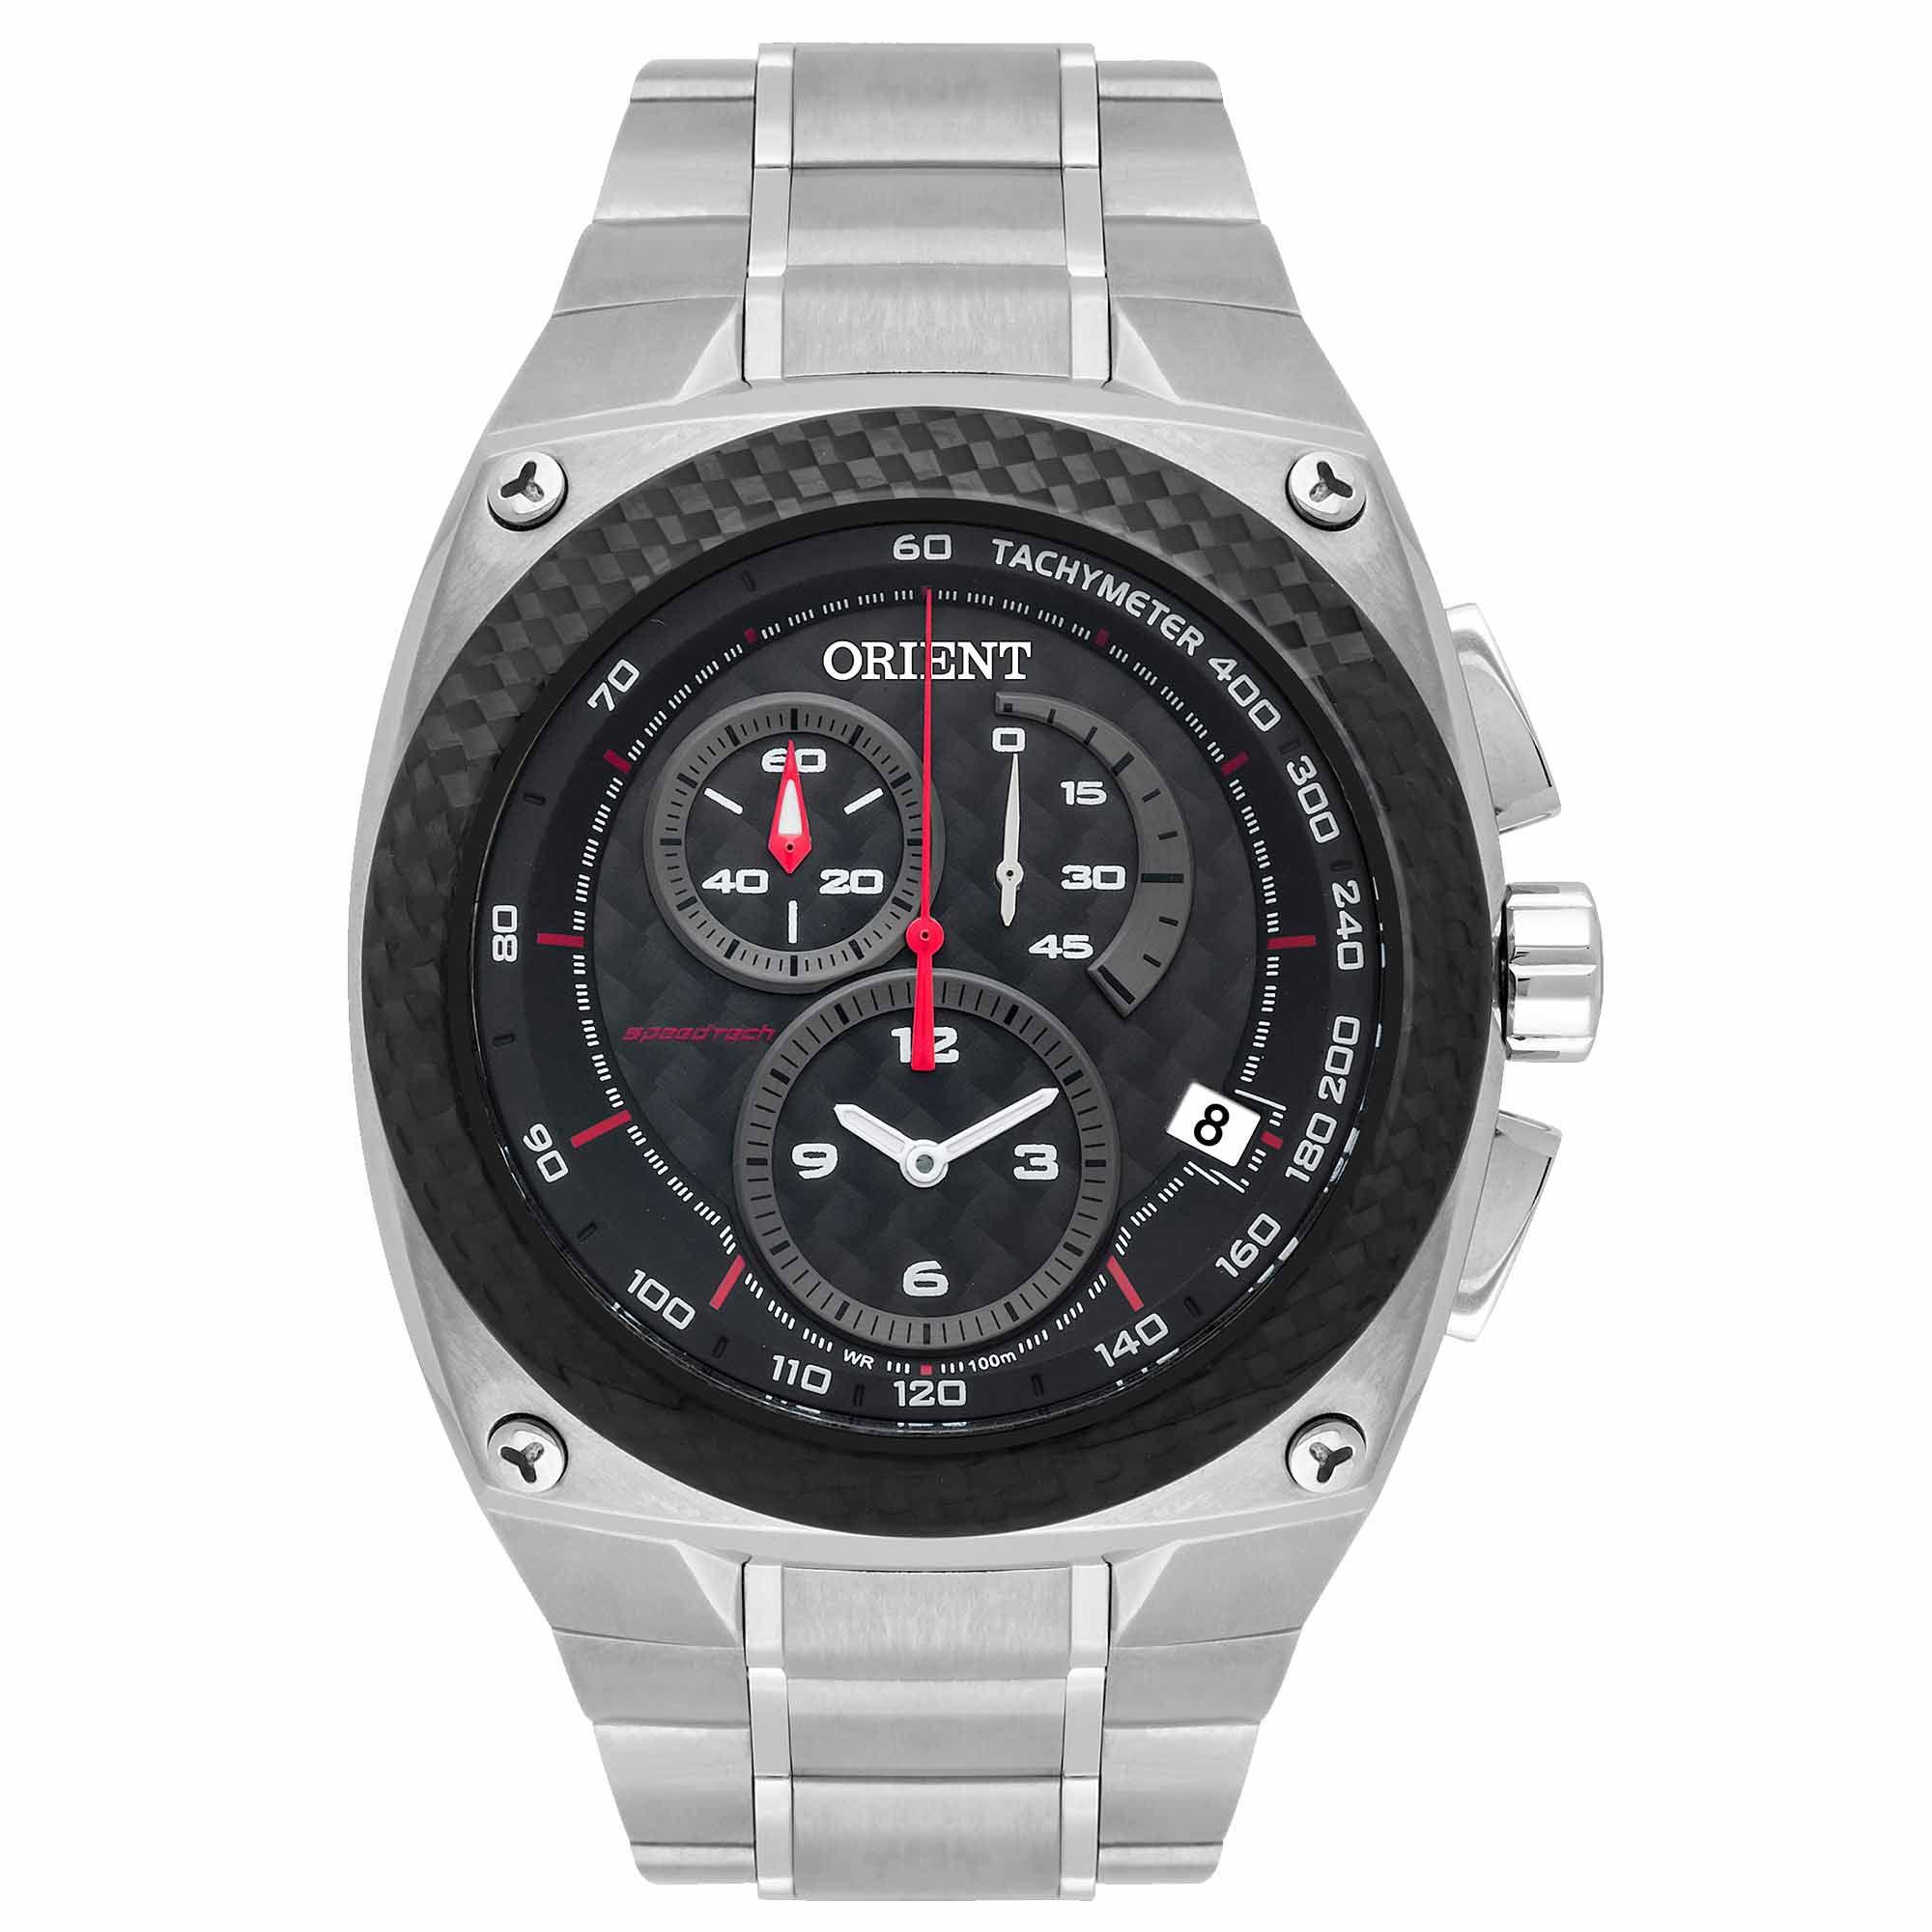 Relógio Masculino Orient MTFTC002 P1SX Edição Limitada 094/207